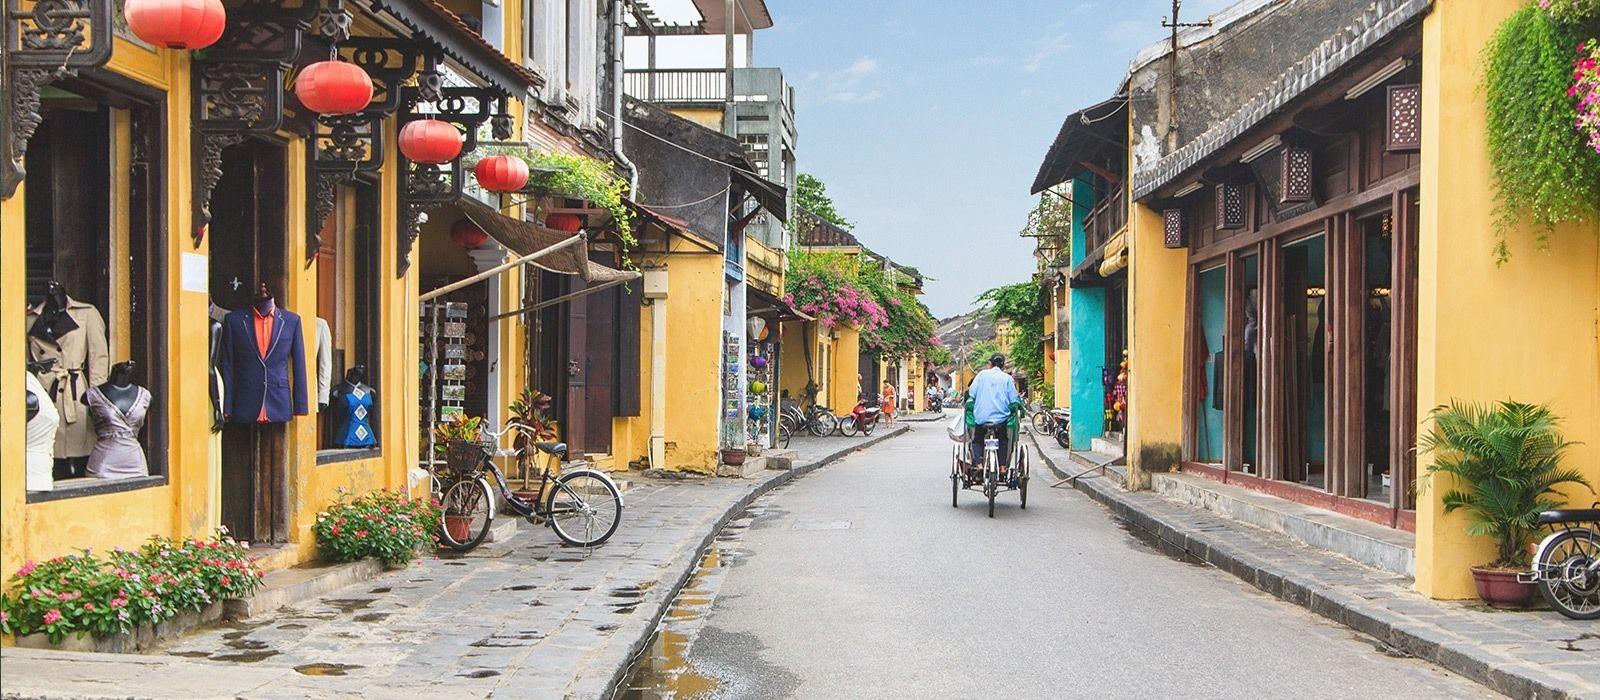 A Grand Journey through South East Asia Tour Trip 6